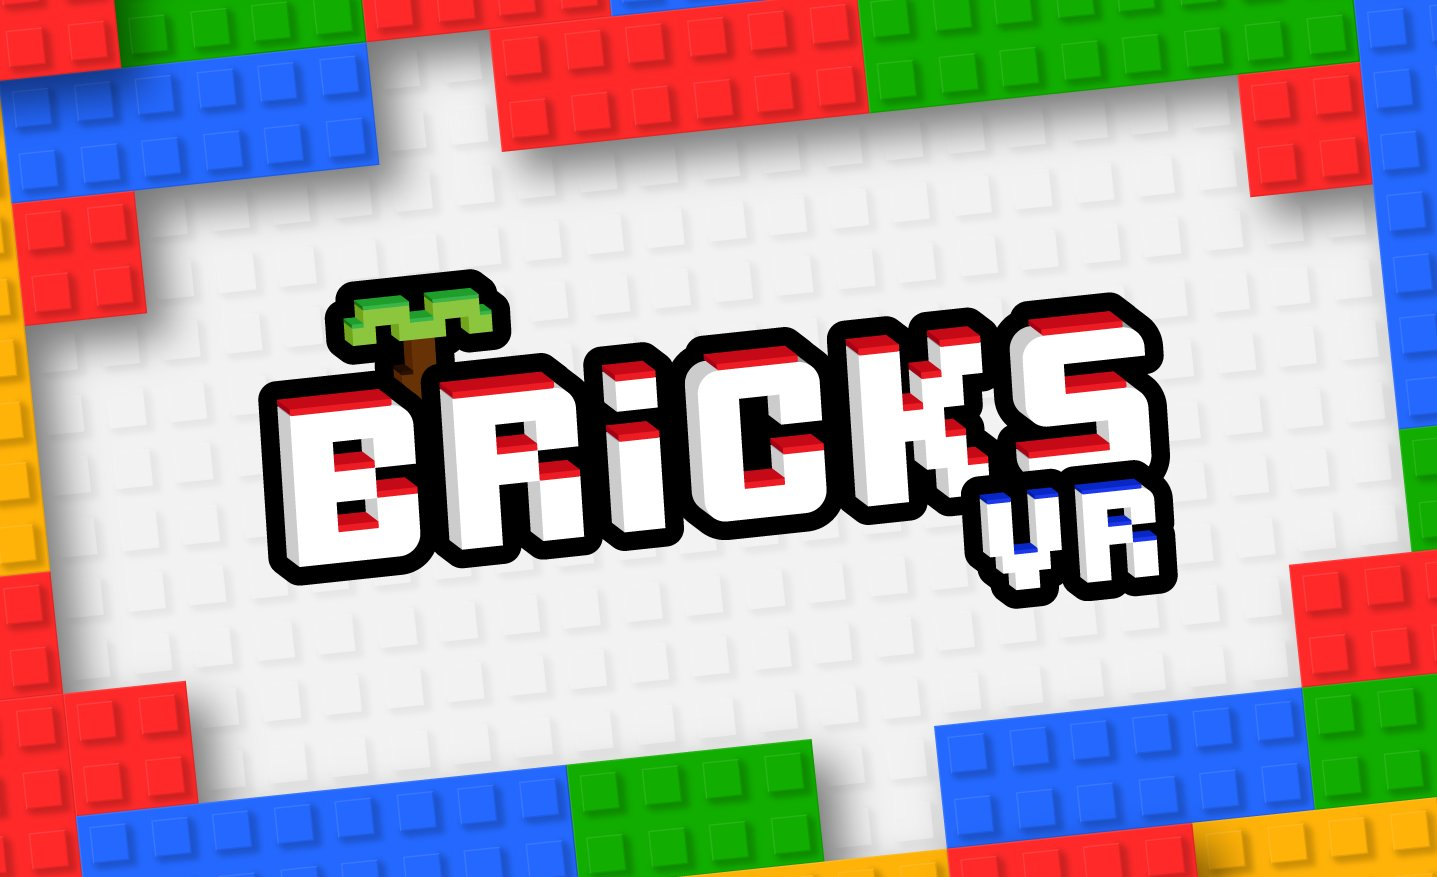 VR建筑沙盒游戏《Bricks VR》现已上线Oculus和Steam平台